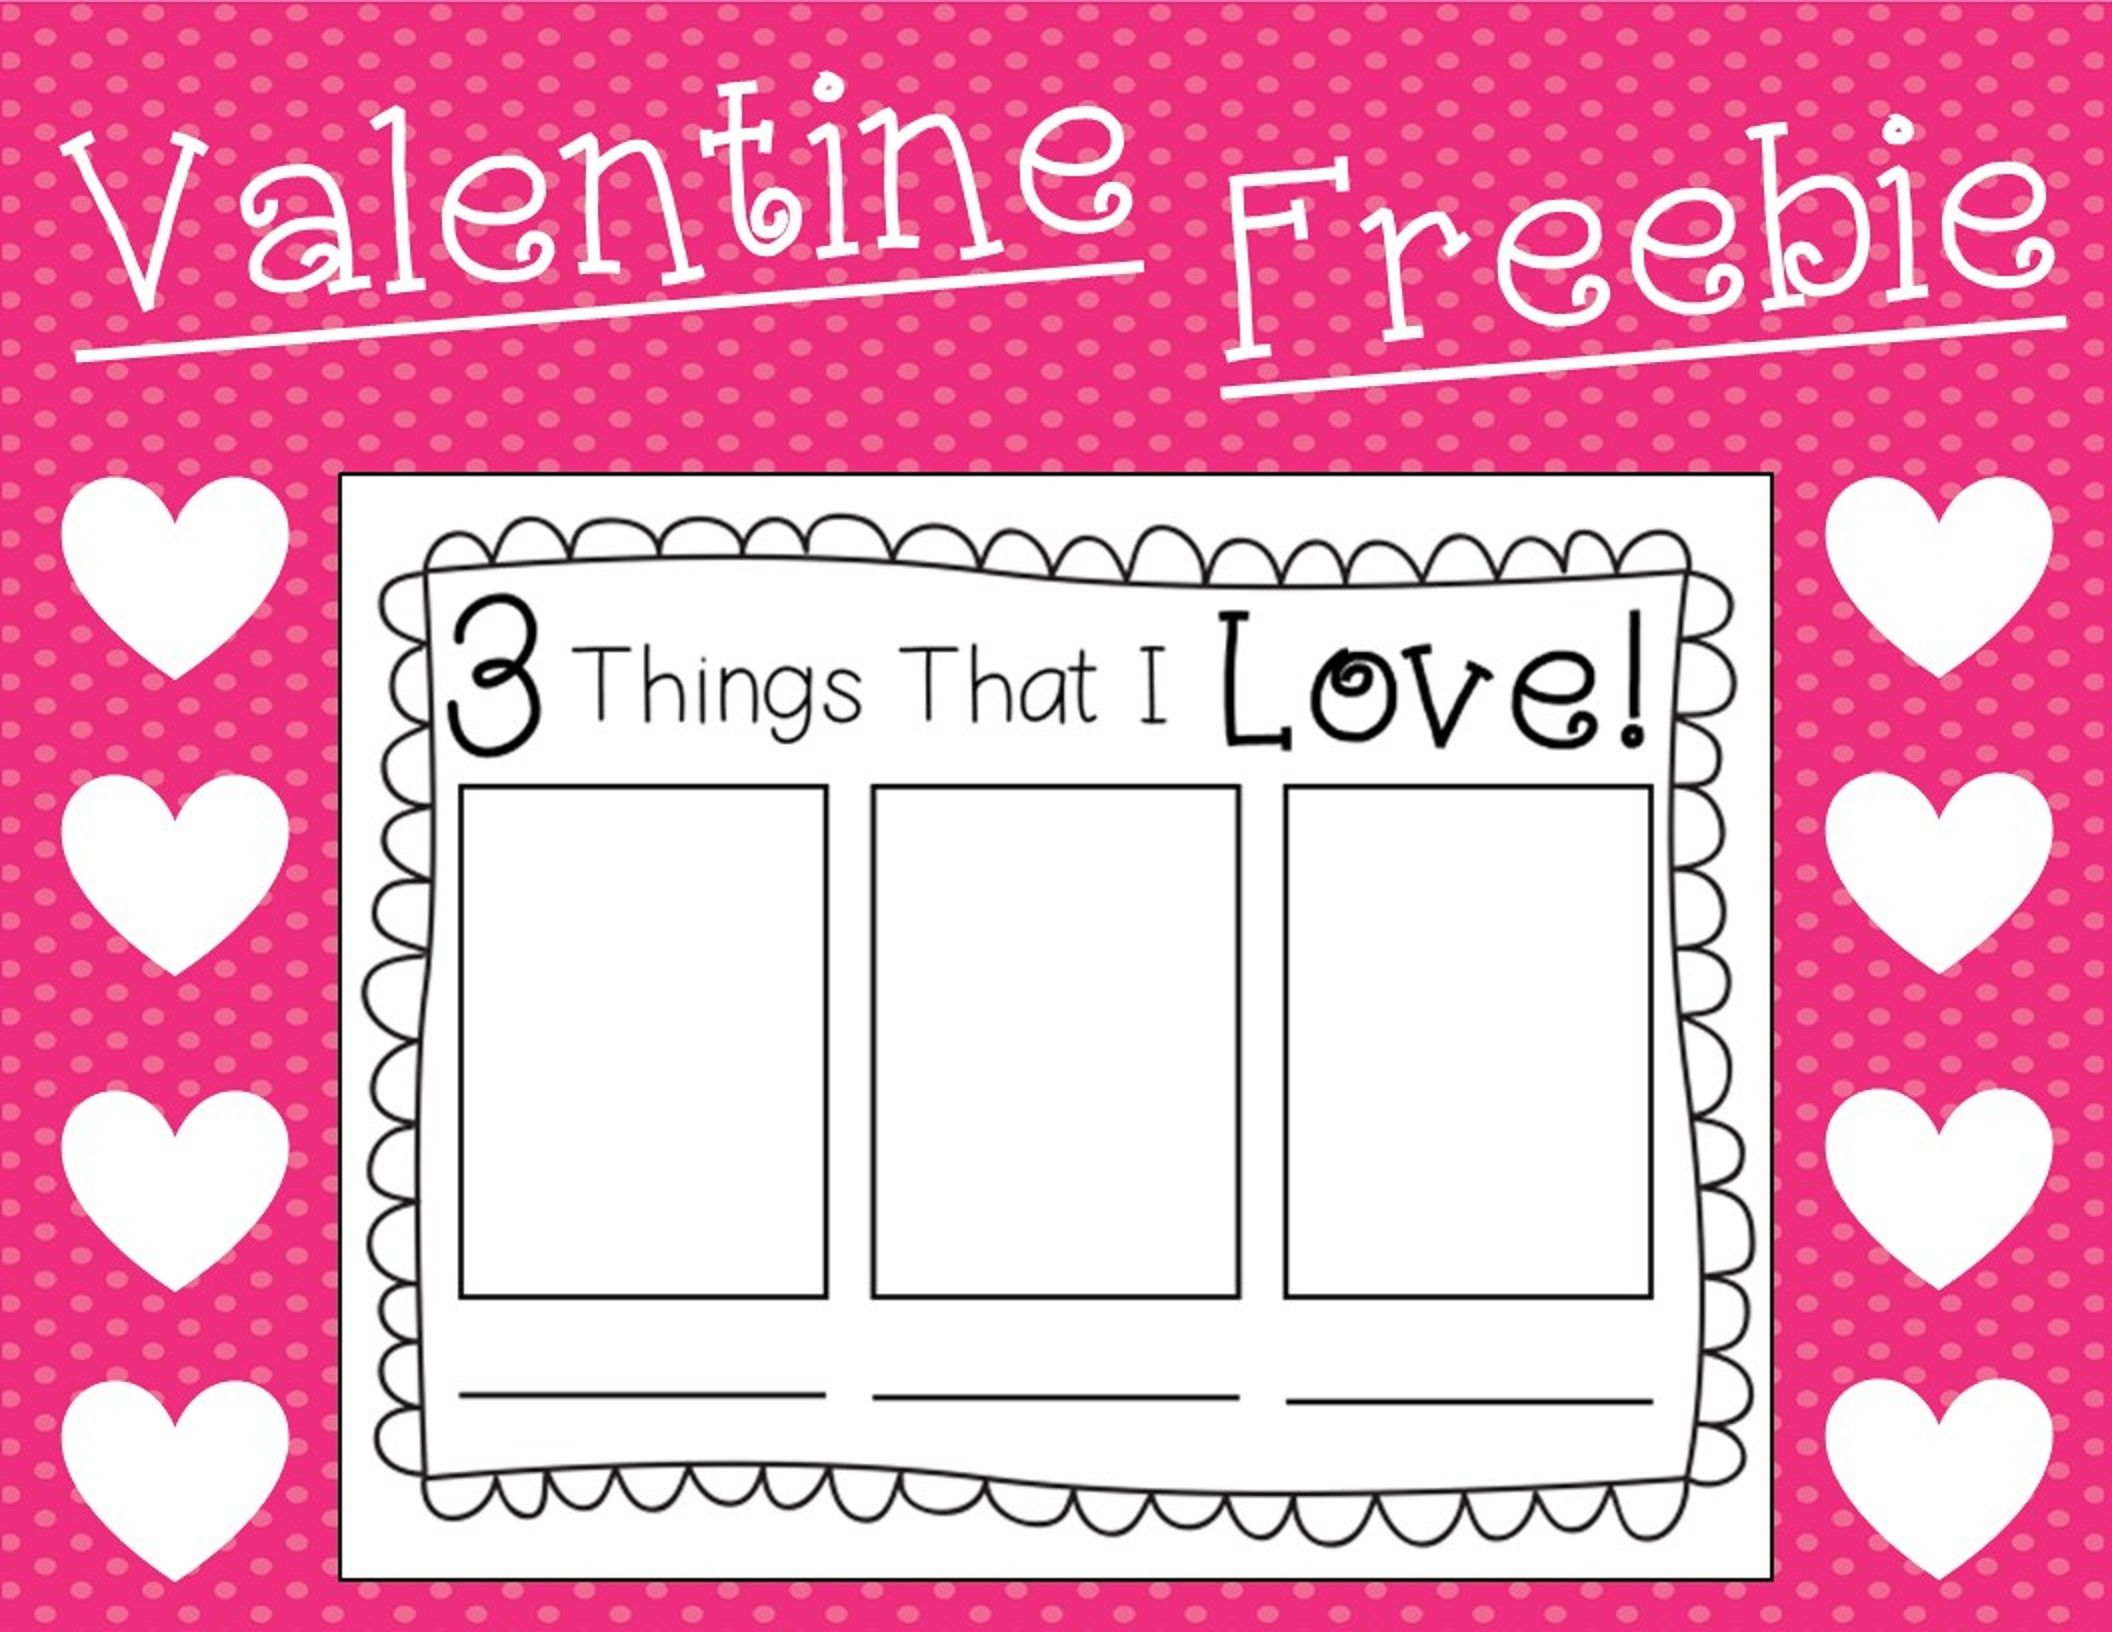 Valentine Freebie Things That I Love